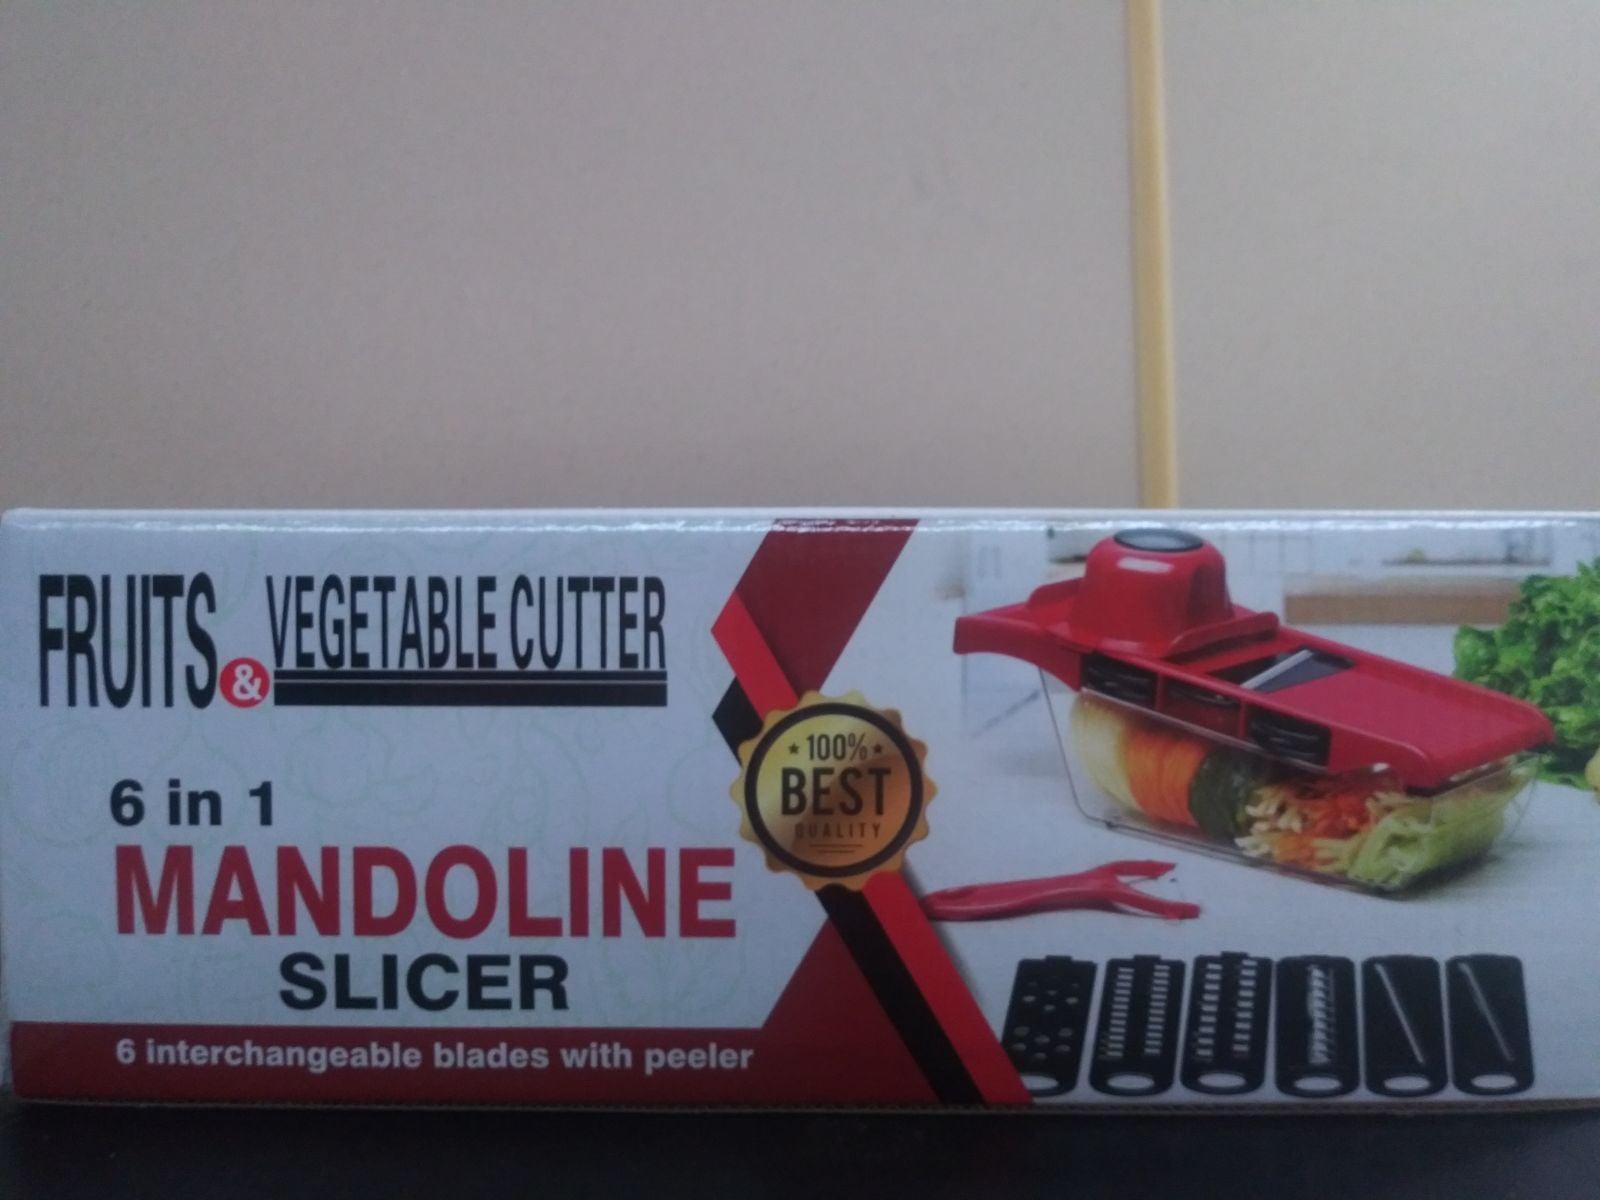 6 in 1 Mandoline Slicer